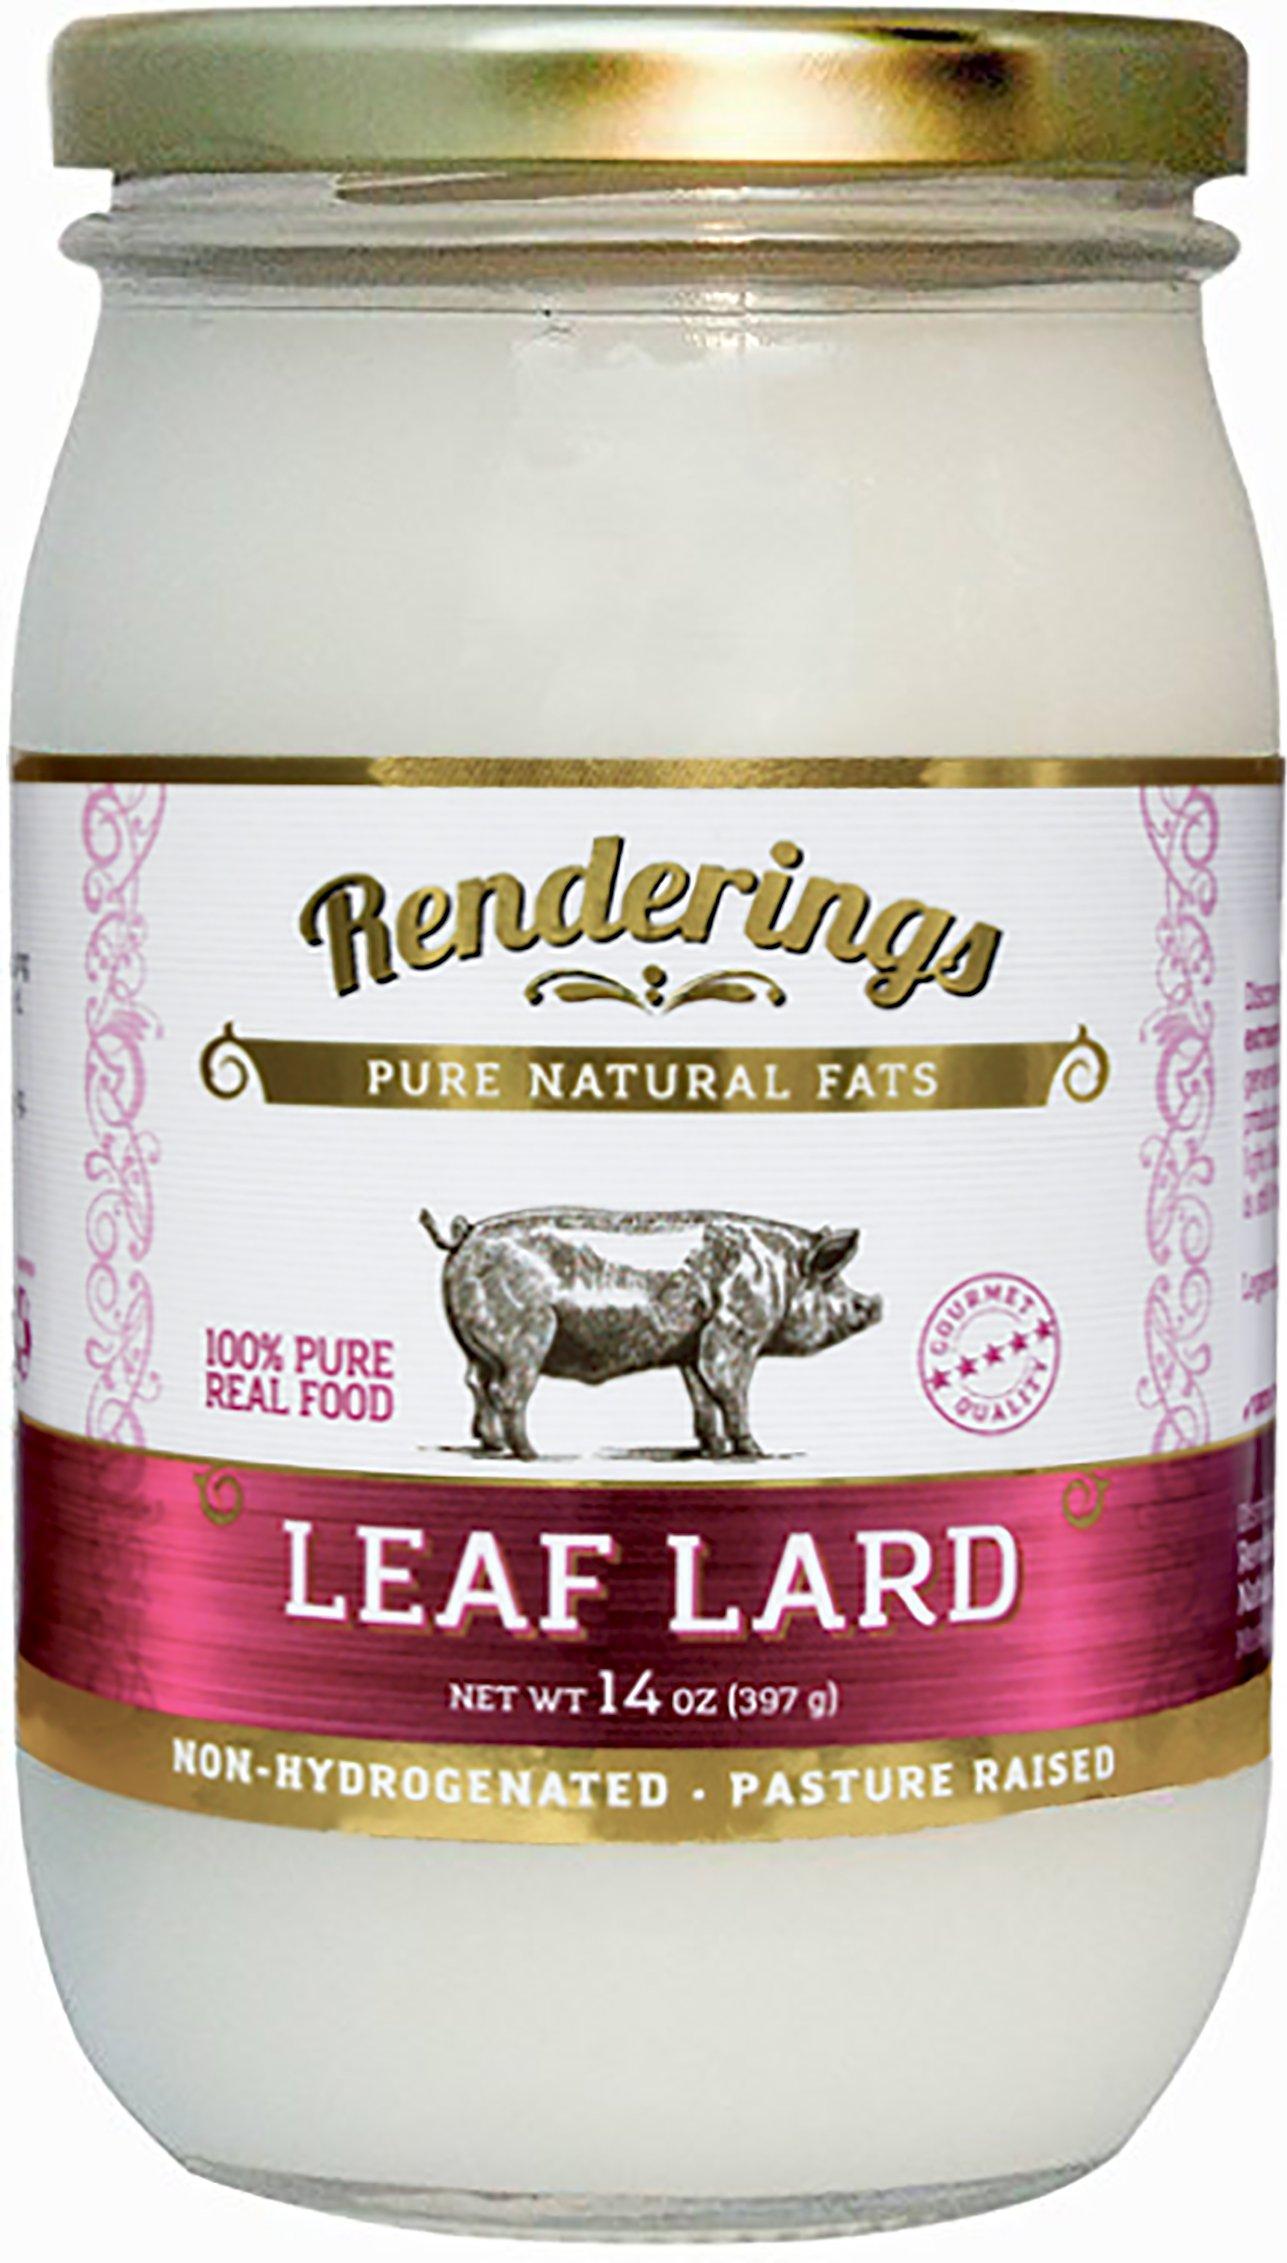 Renderings Gold Label Leaf Lard — Premium Non-Hydrogenated Leaf Lard — Pasture Raised — Cooking & Baking Oil — 14 oz jar